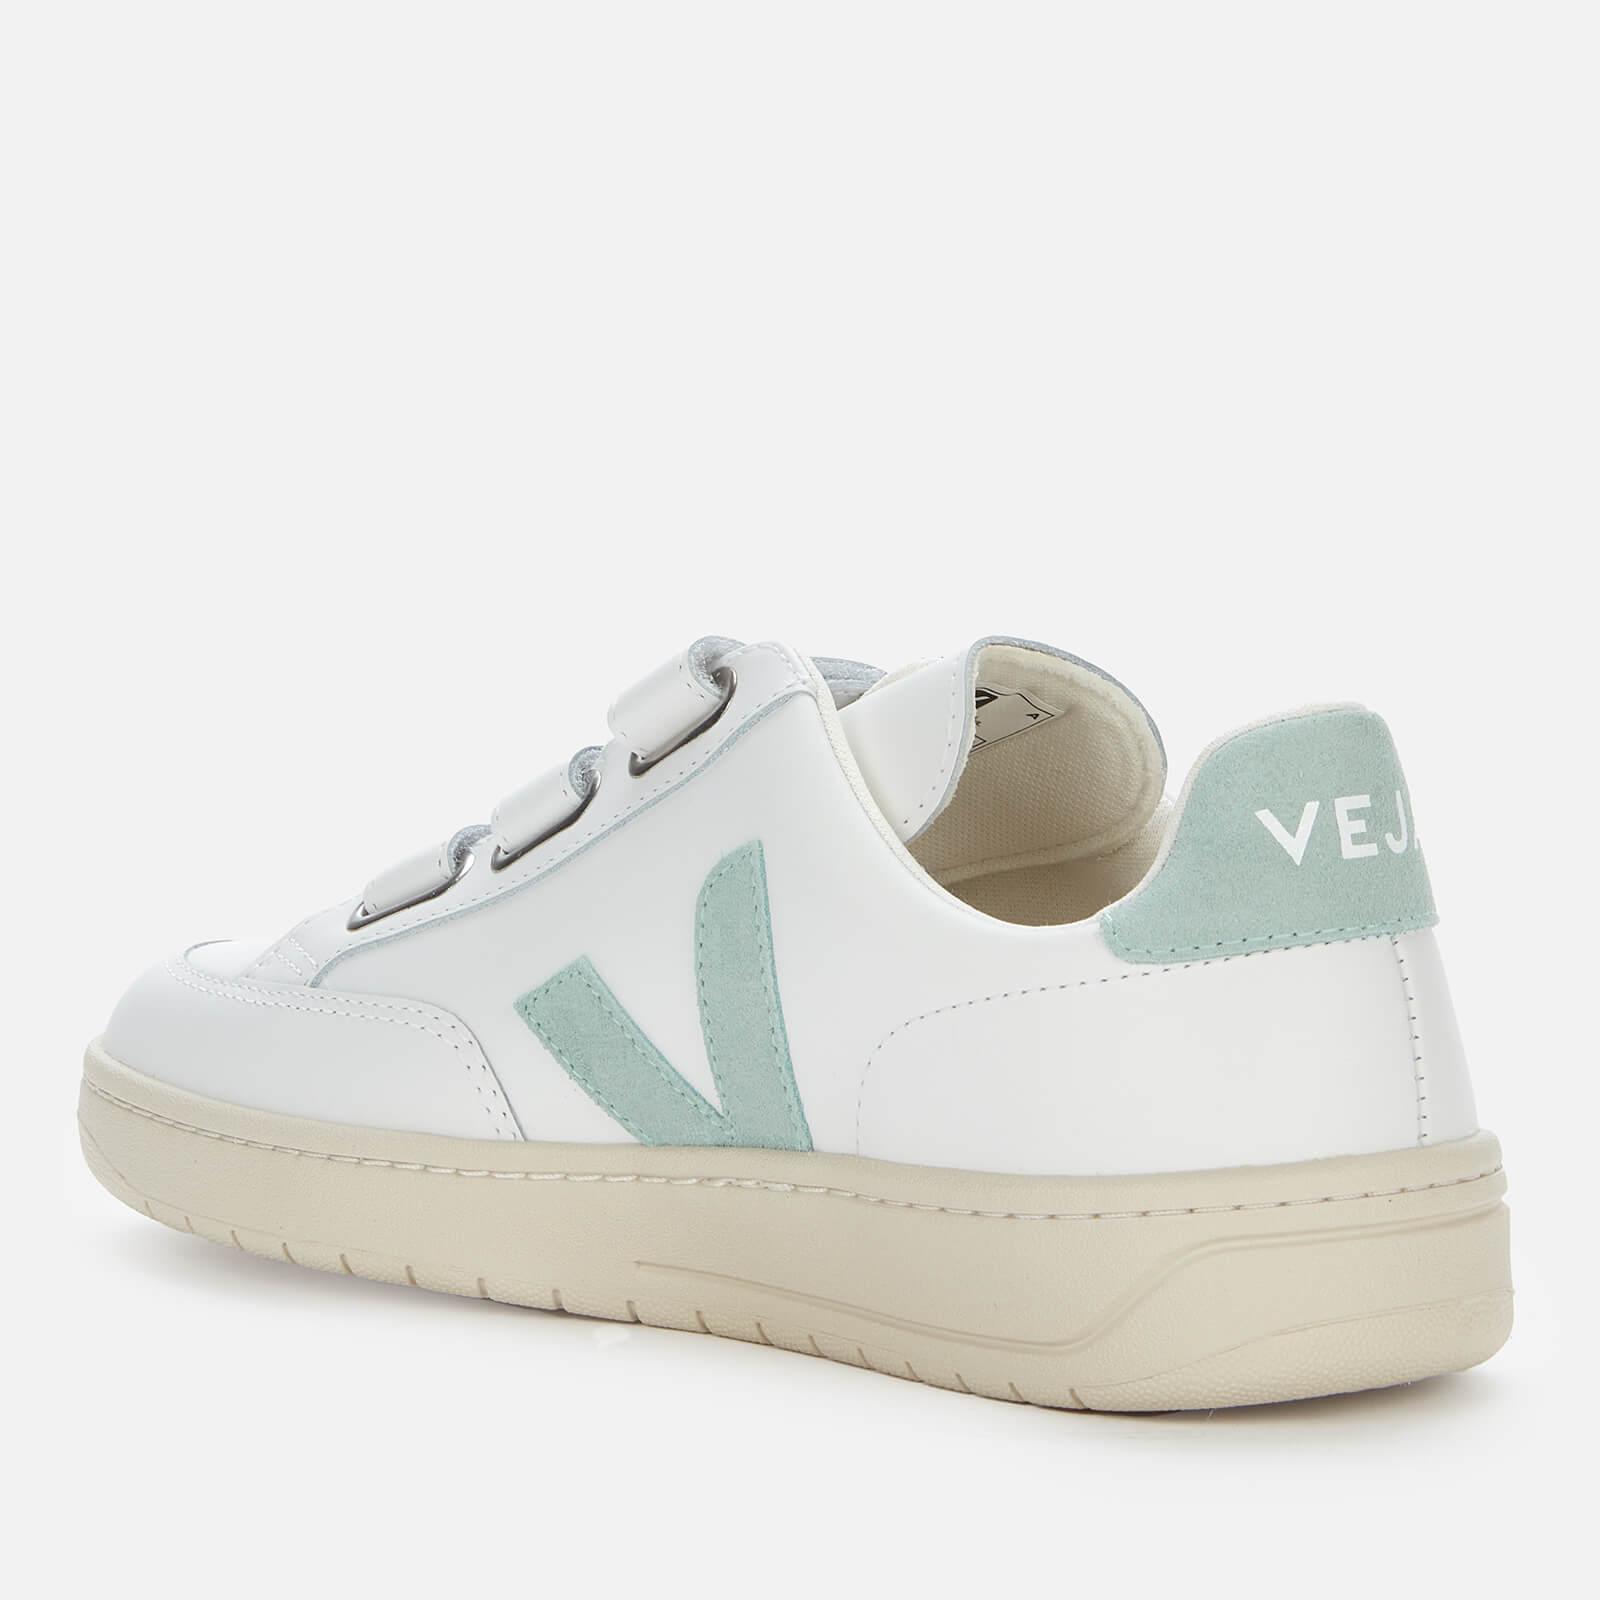 Veja Women's V-Lock Leather Trainers - Extra White/Matcha